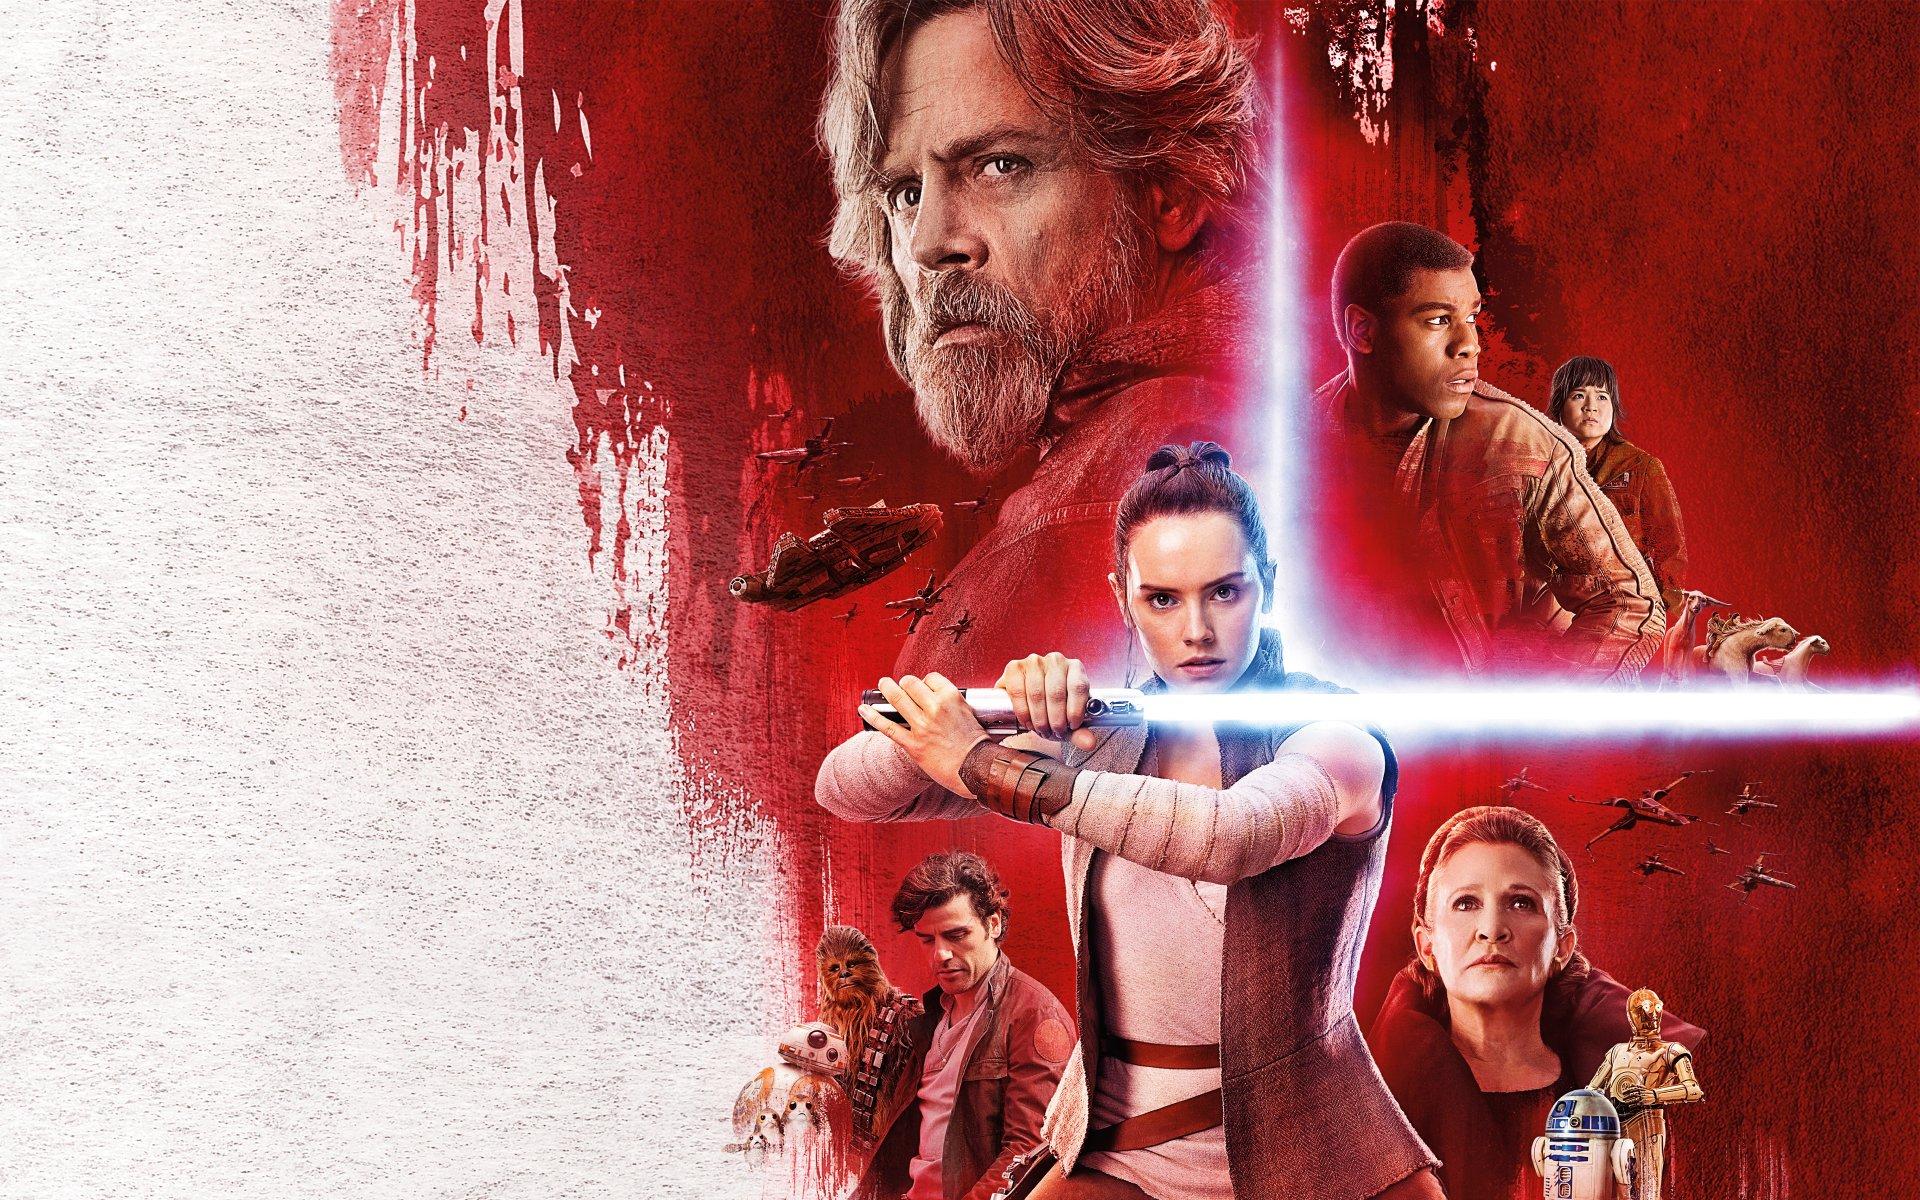 Hd Wallpapers Assassins Creed Fondos De Star Wars Viii Los Ultimos Jedi The Last Jedi